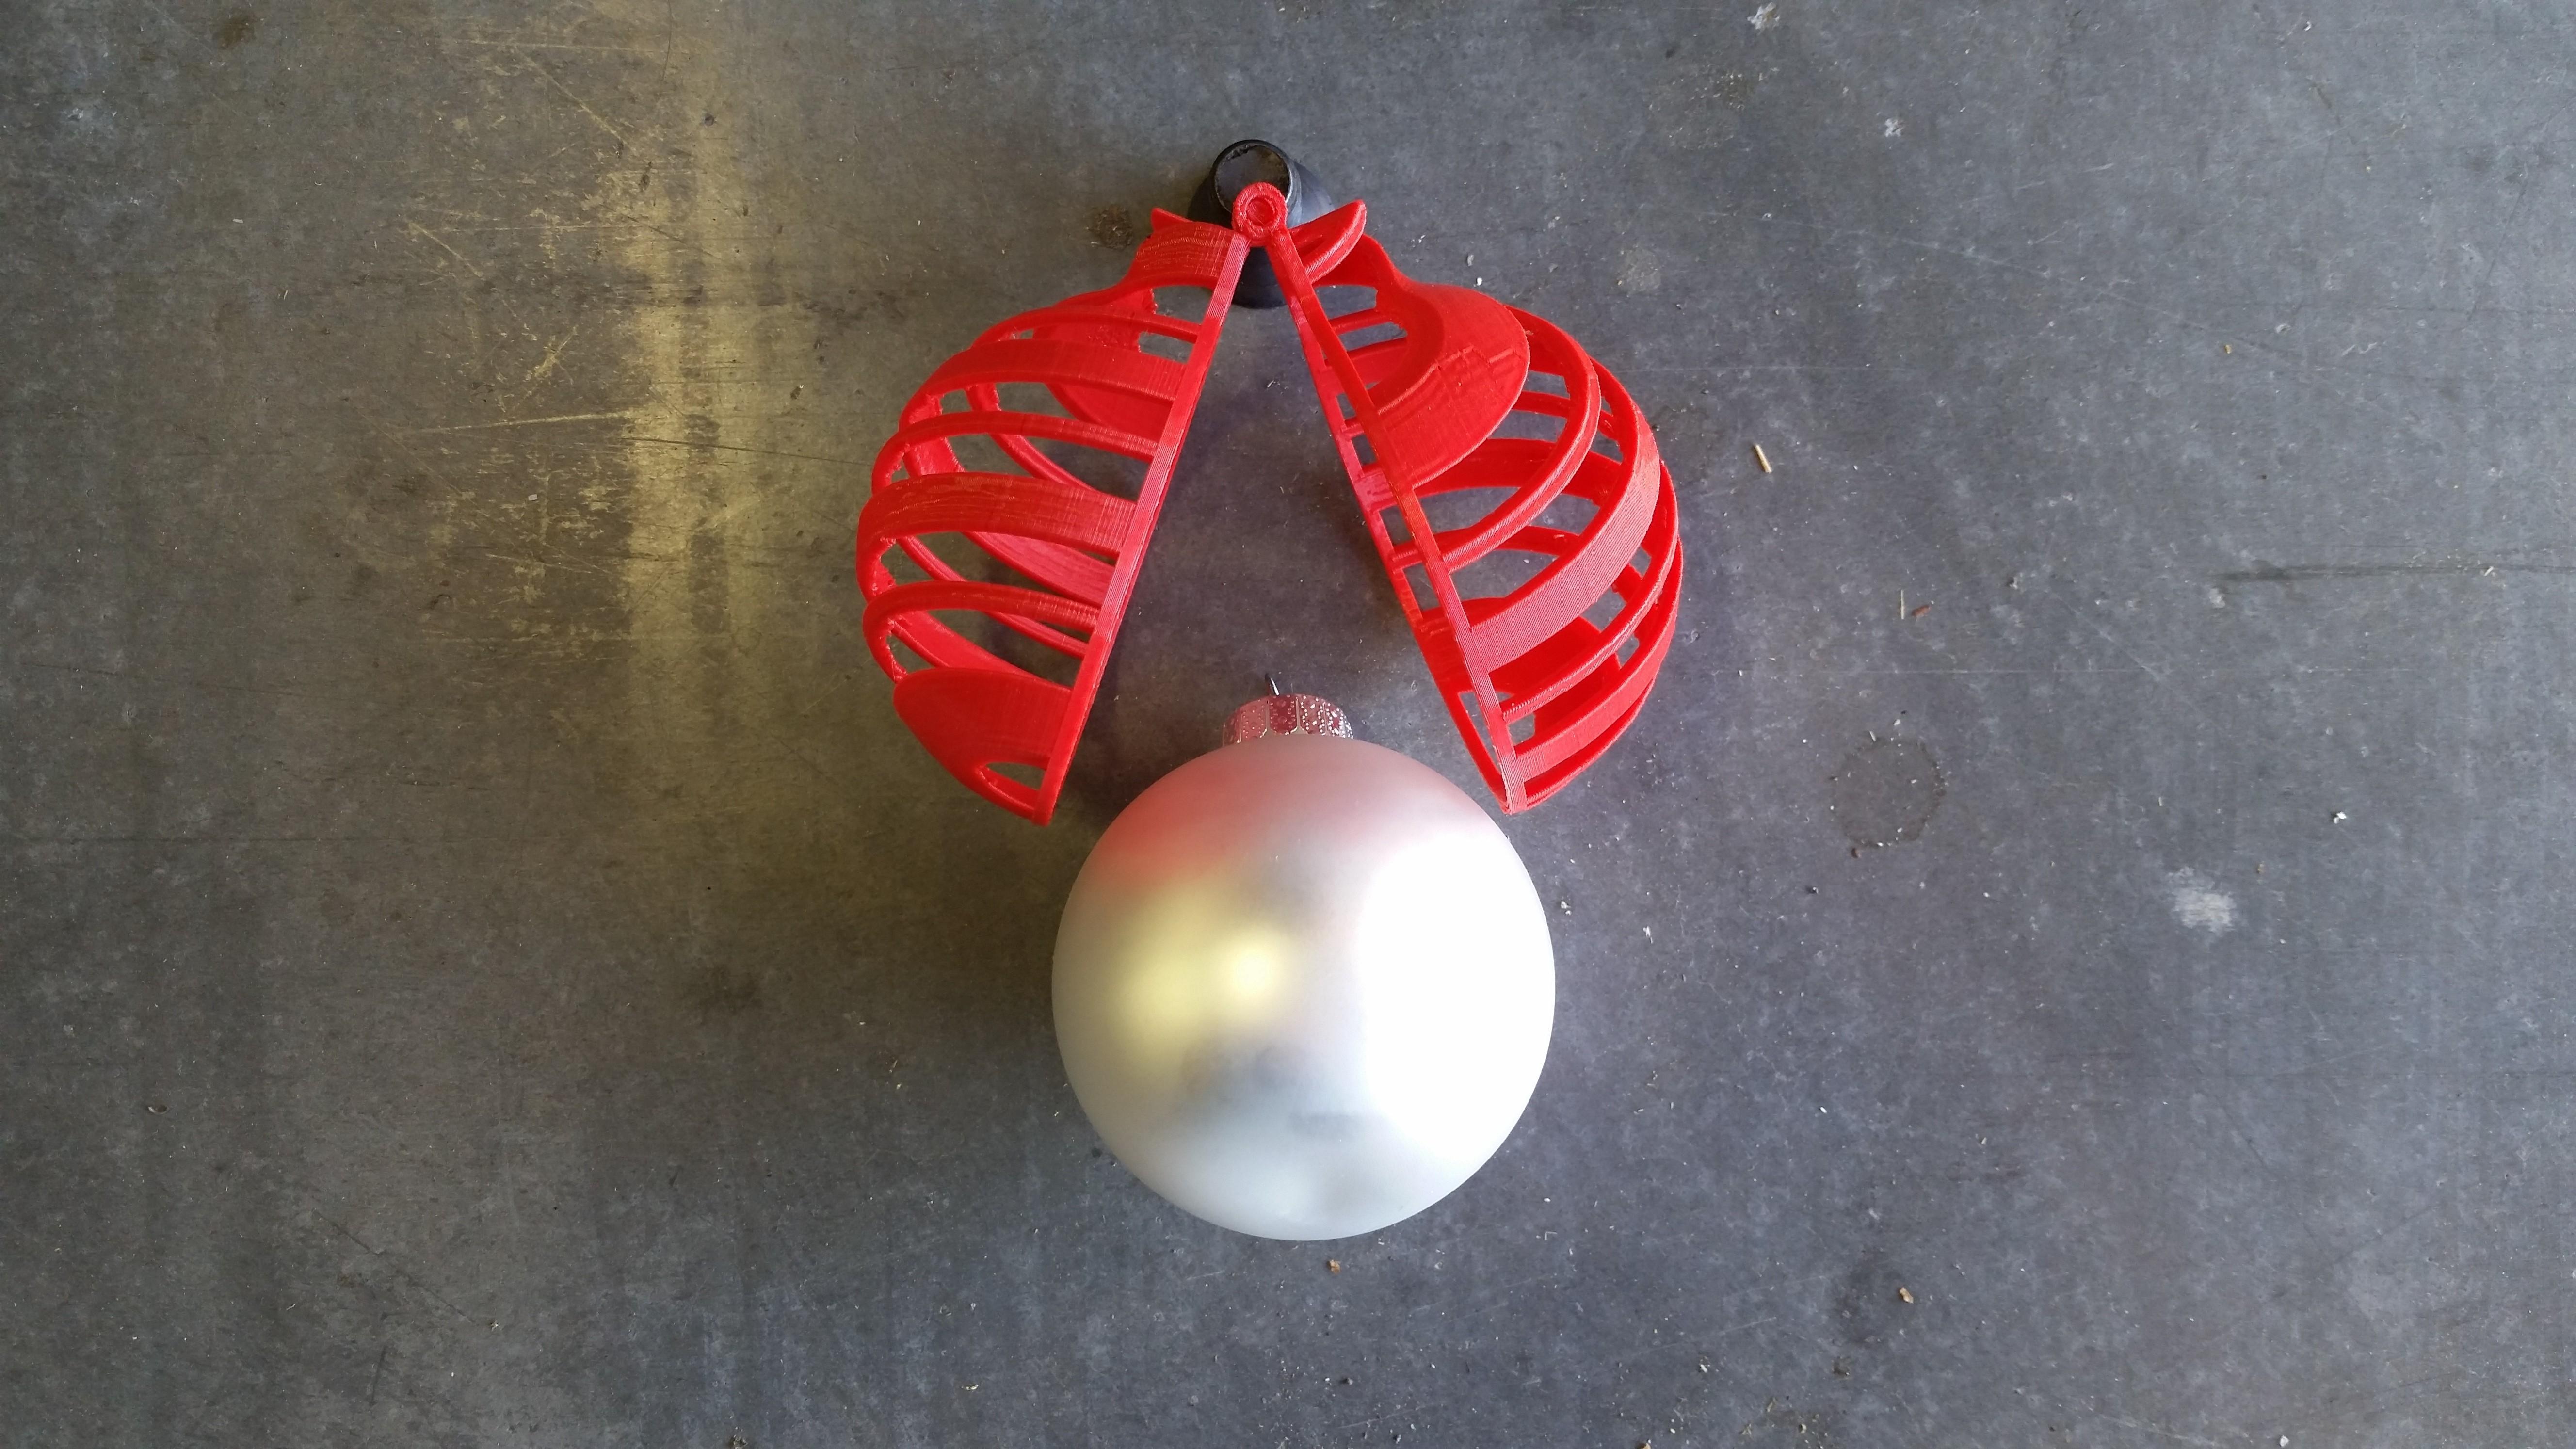 20141107_092552.jpg Download free STL file Decorative Ornament Cage • 3D printable object, Porda